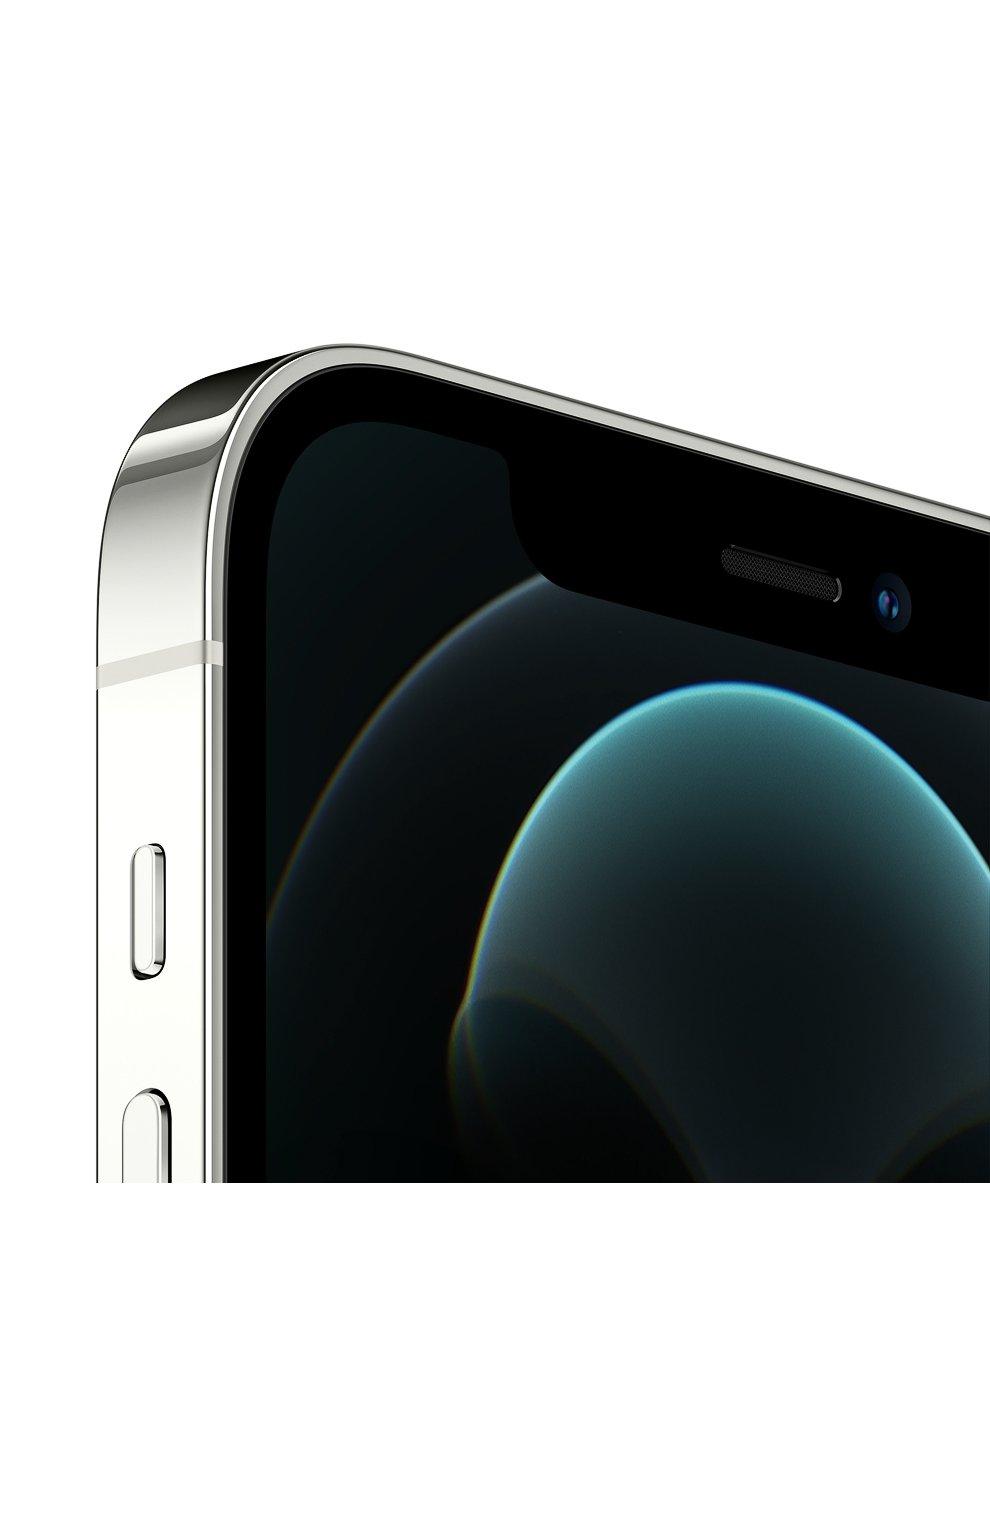 Iphone 12 pro 256gb silver APPLE  silver цвета, арт. MGMQ3RU/A | Фото 2